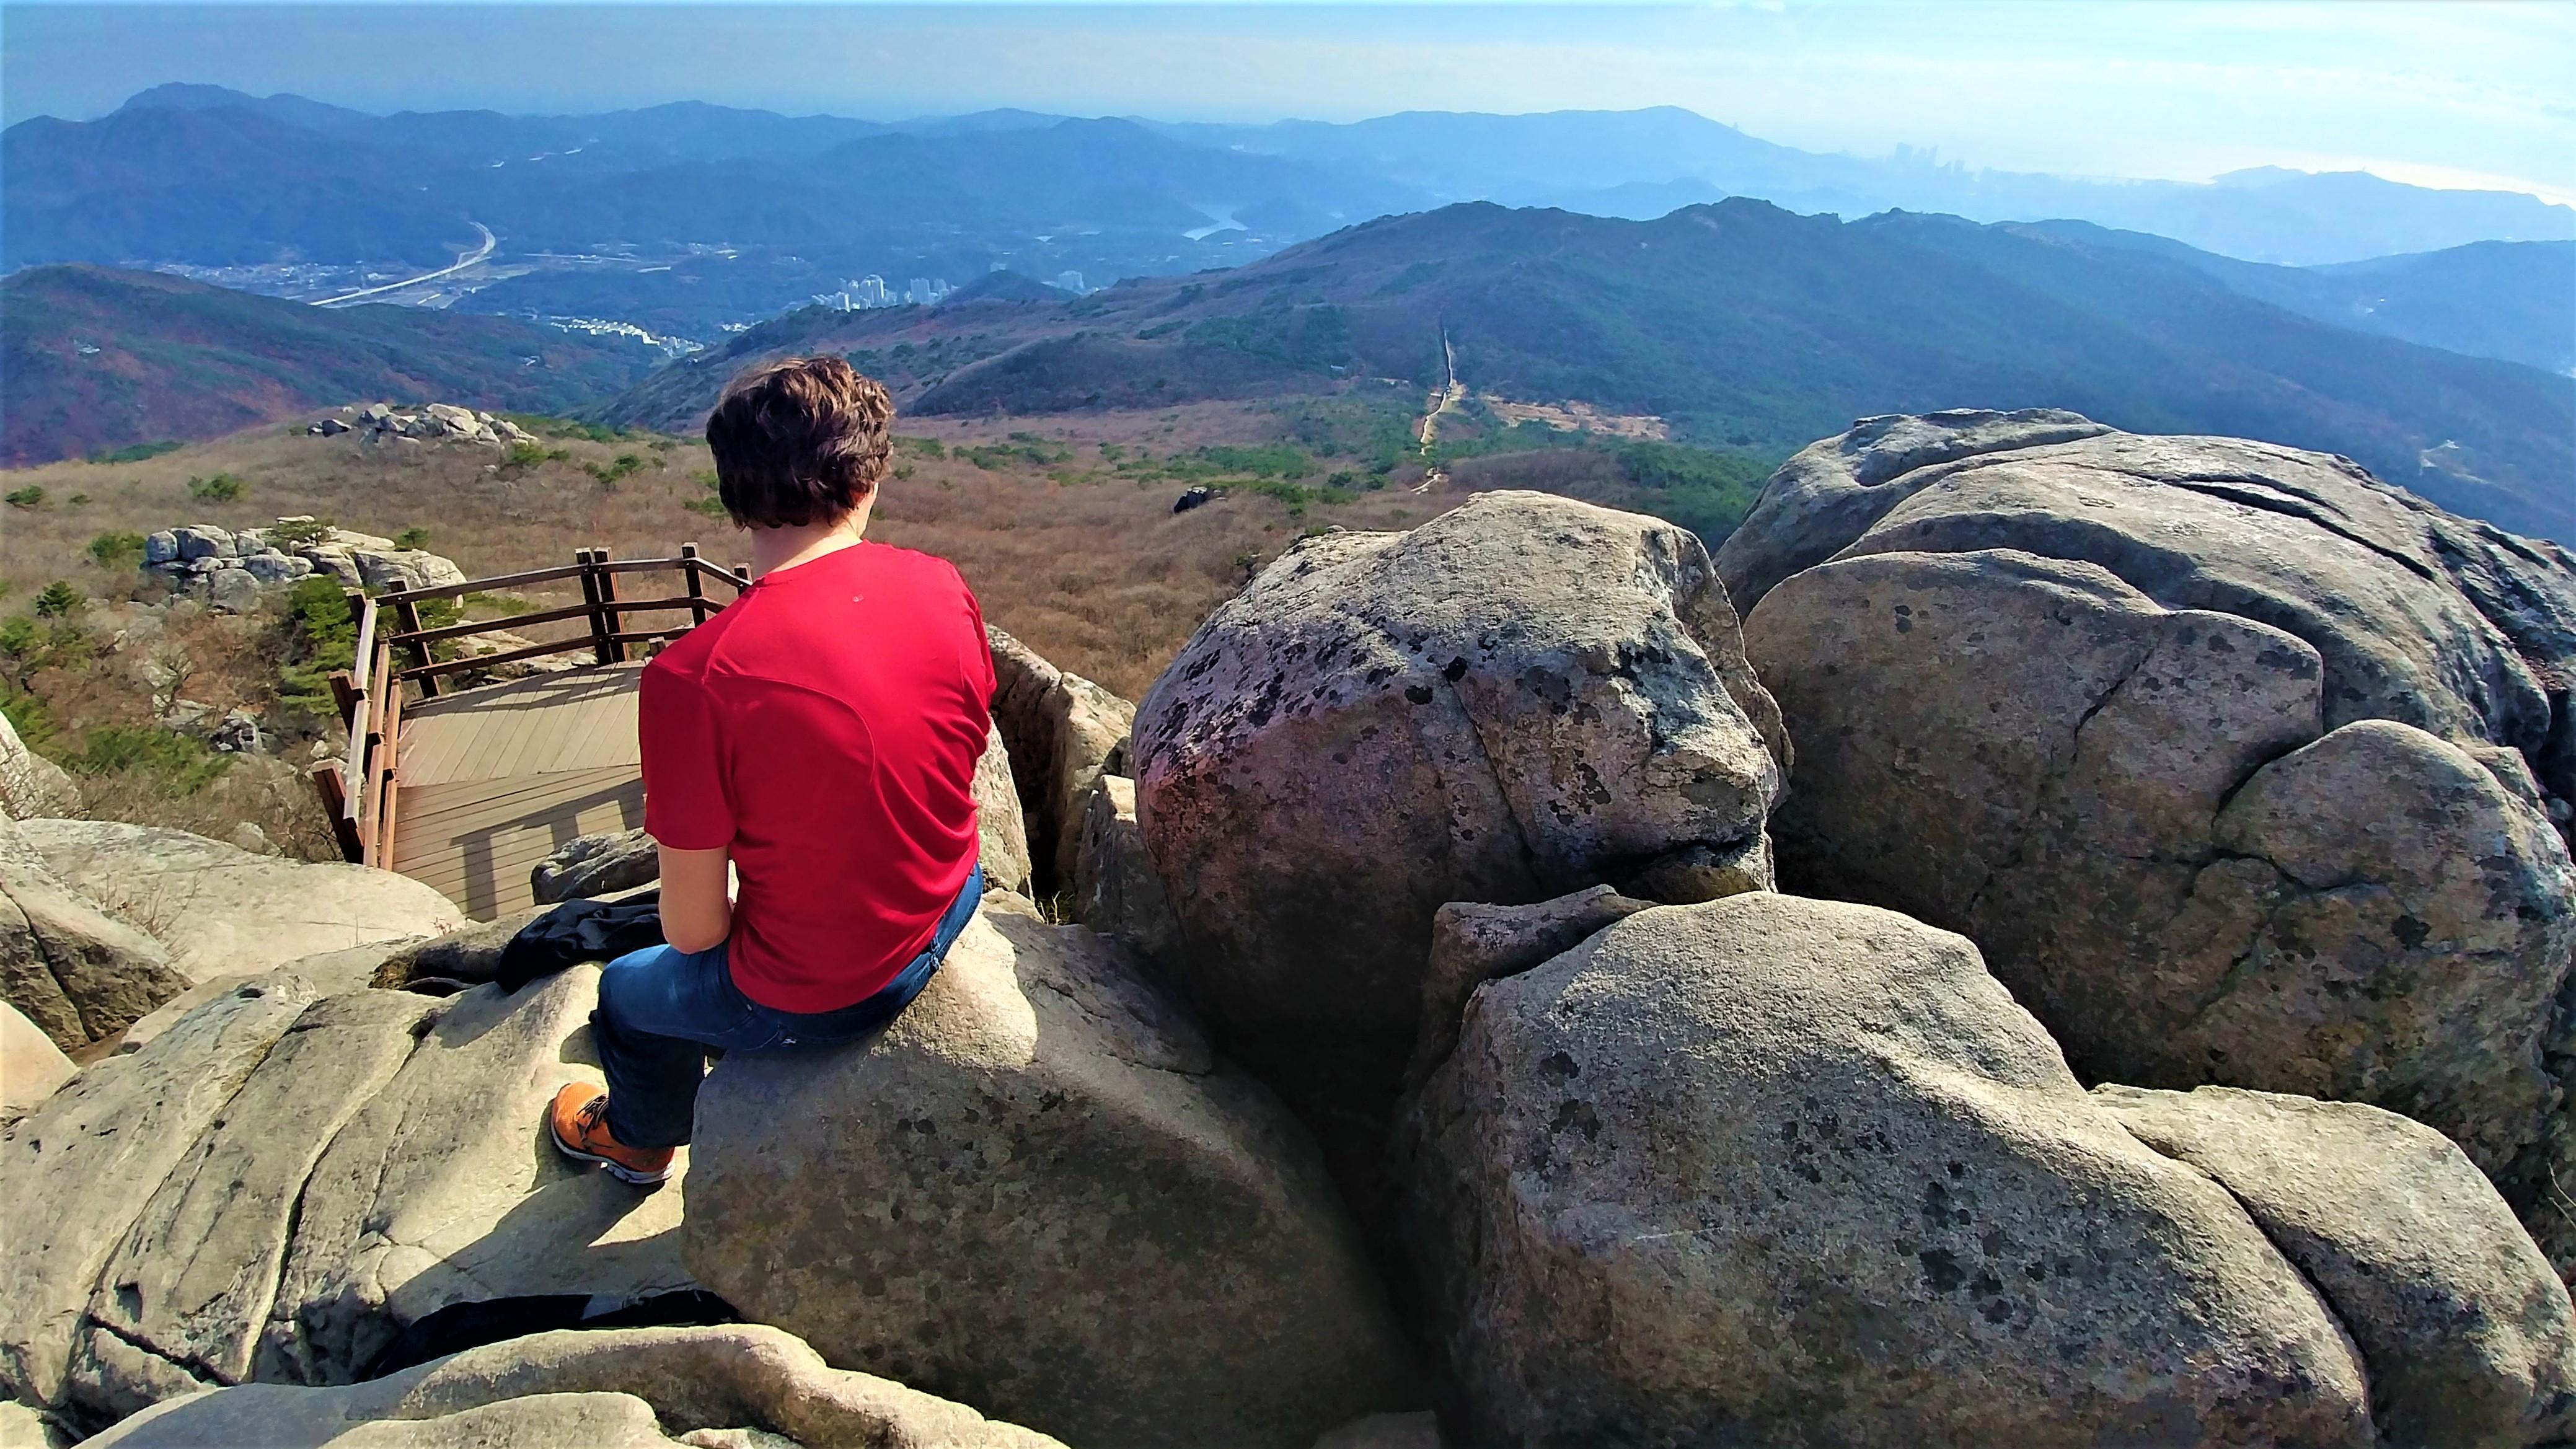 Busan montagne muraille Gobangbong randonnee temple beomeosa blog voyage coree du sud arpenter le chemin